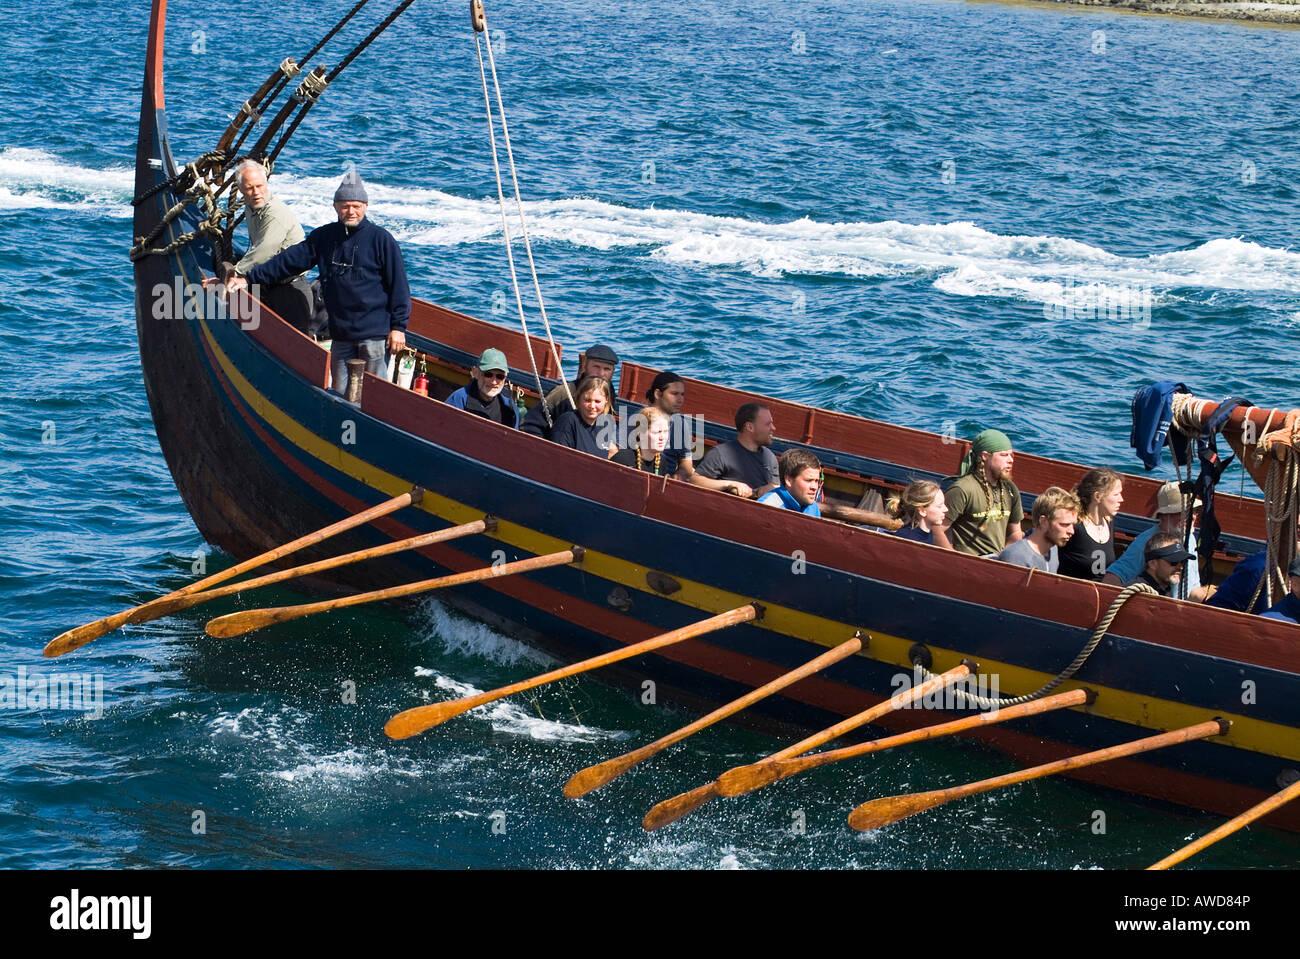 dh Sea Stallion KIRKWALL ORKNEY Sailors rowing viking Havhingsten fra Glendalough boat longship rowers oar - Stock Image